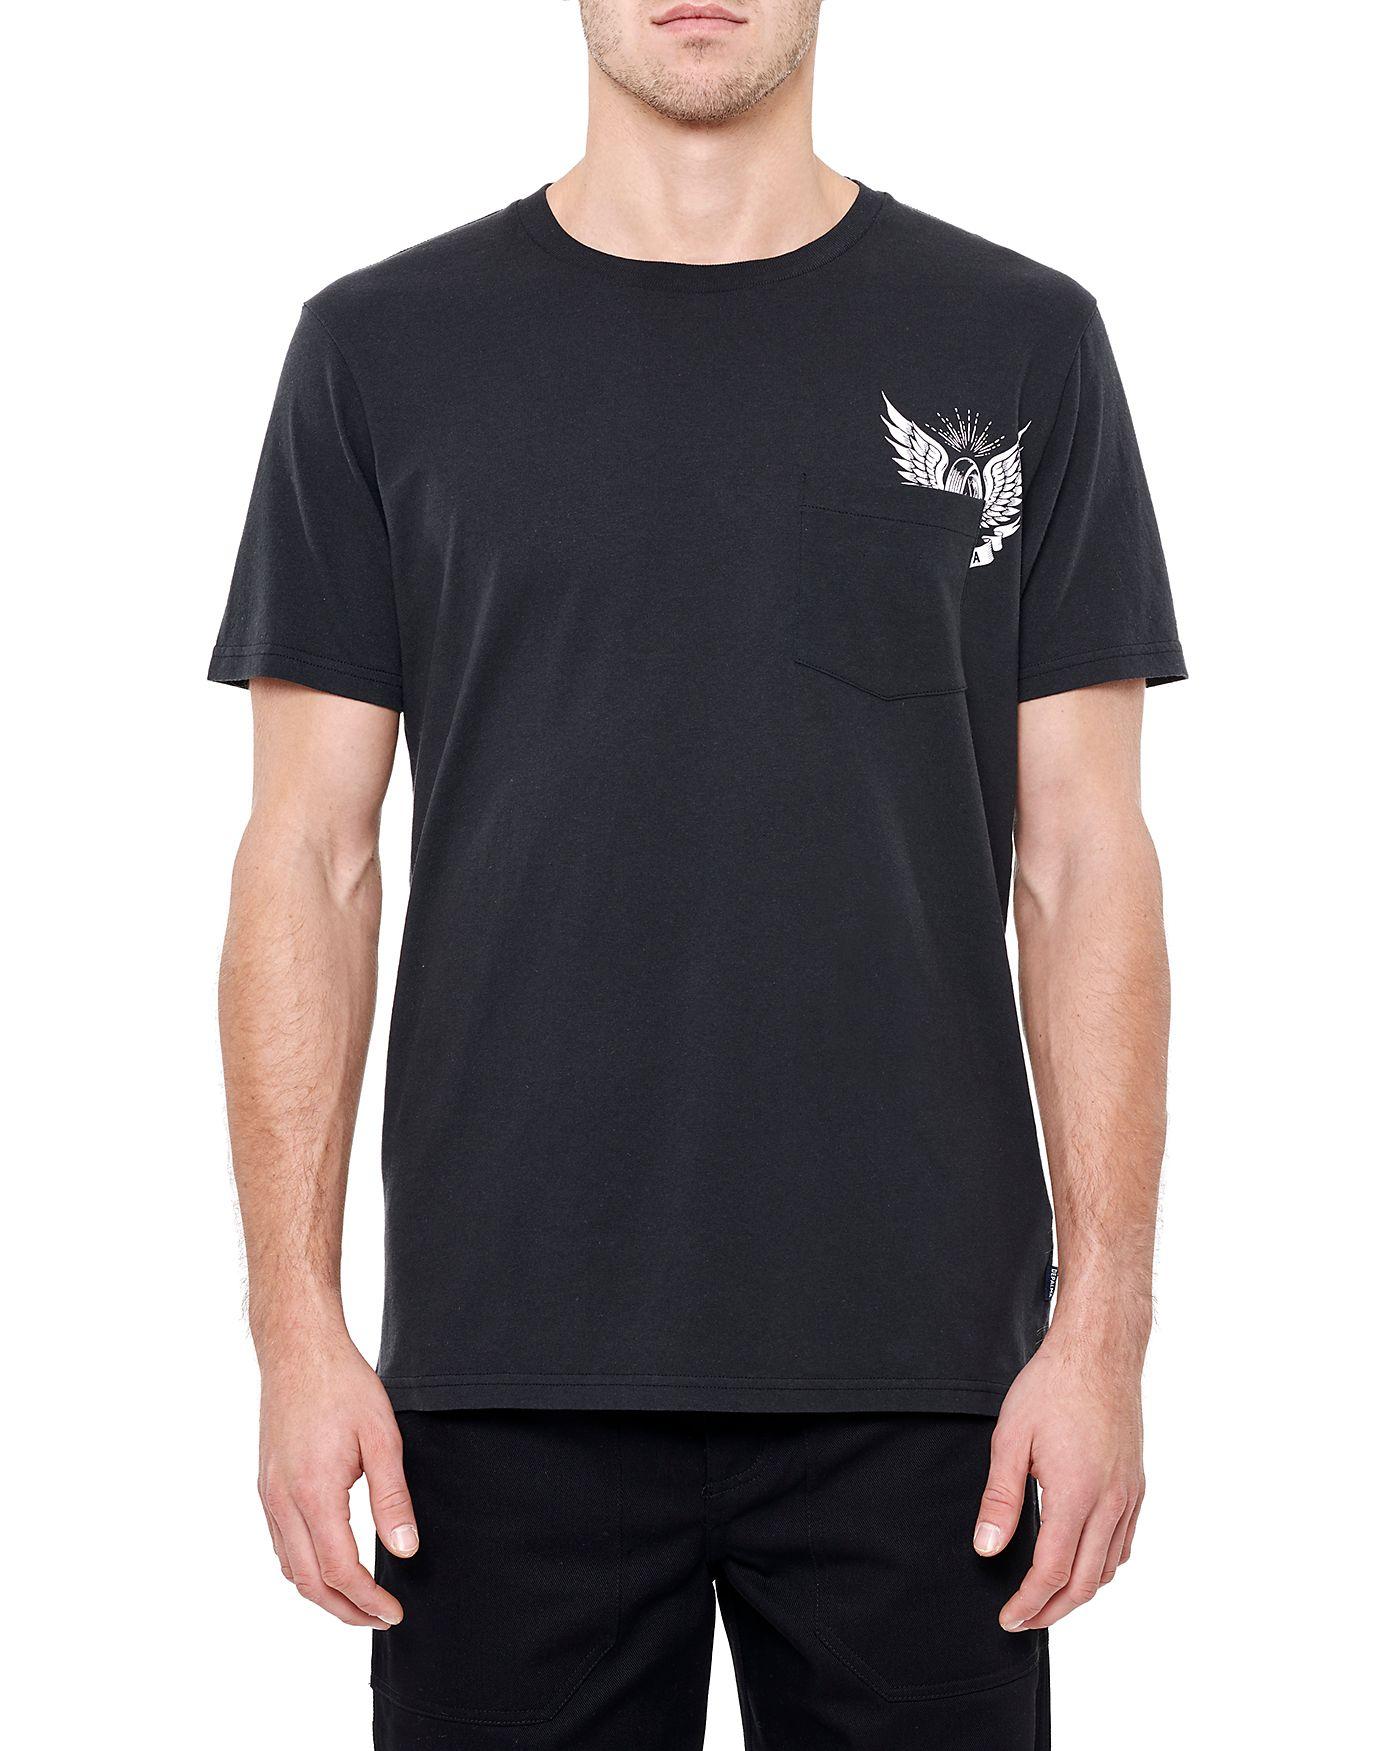 Photo of Thunder Road Pocket S/S Pocket T-shirt, Black